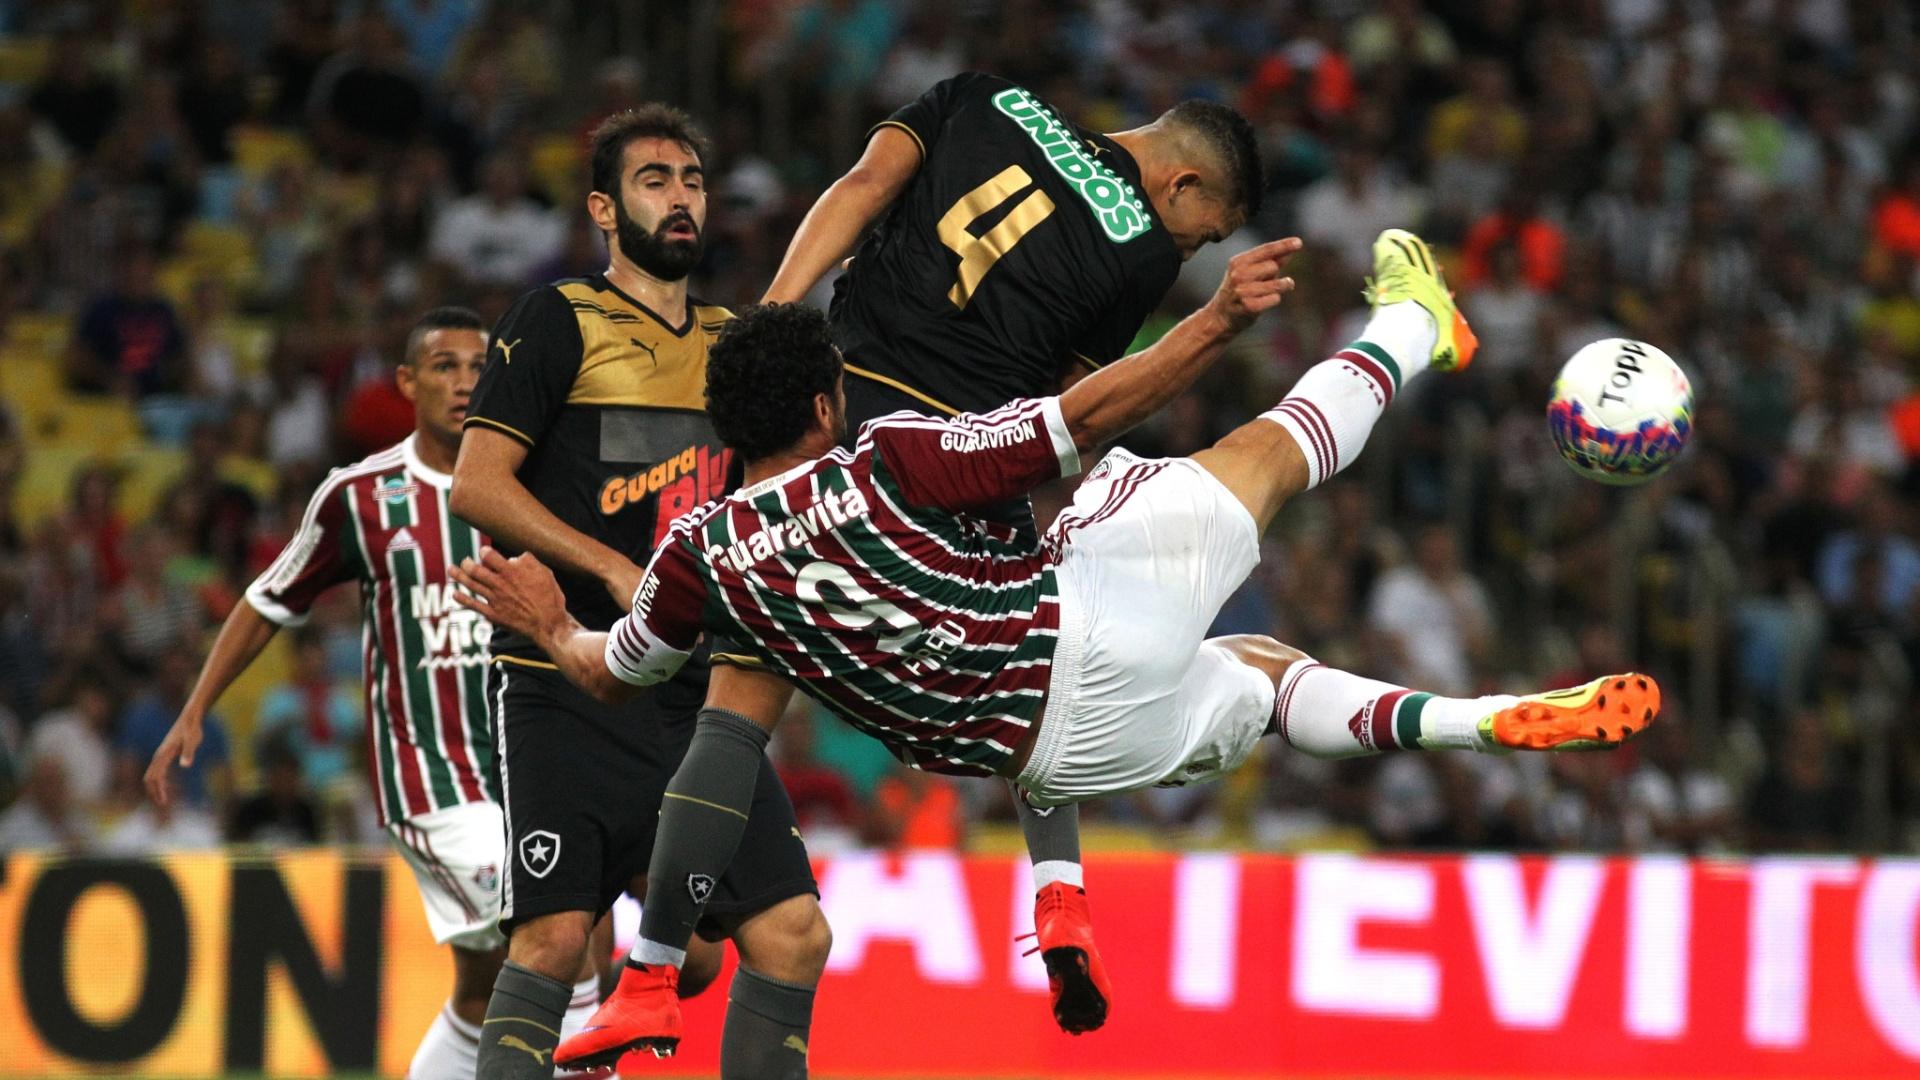 Fred, de voleio, tenta concluir jogada dentro da área durante a partida Fluminense e Botafogo, válida pelo Campeonato Carioca